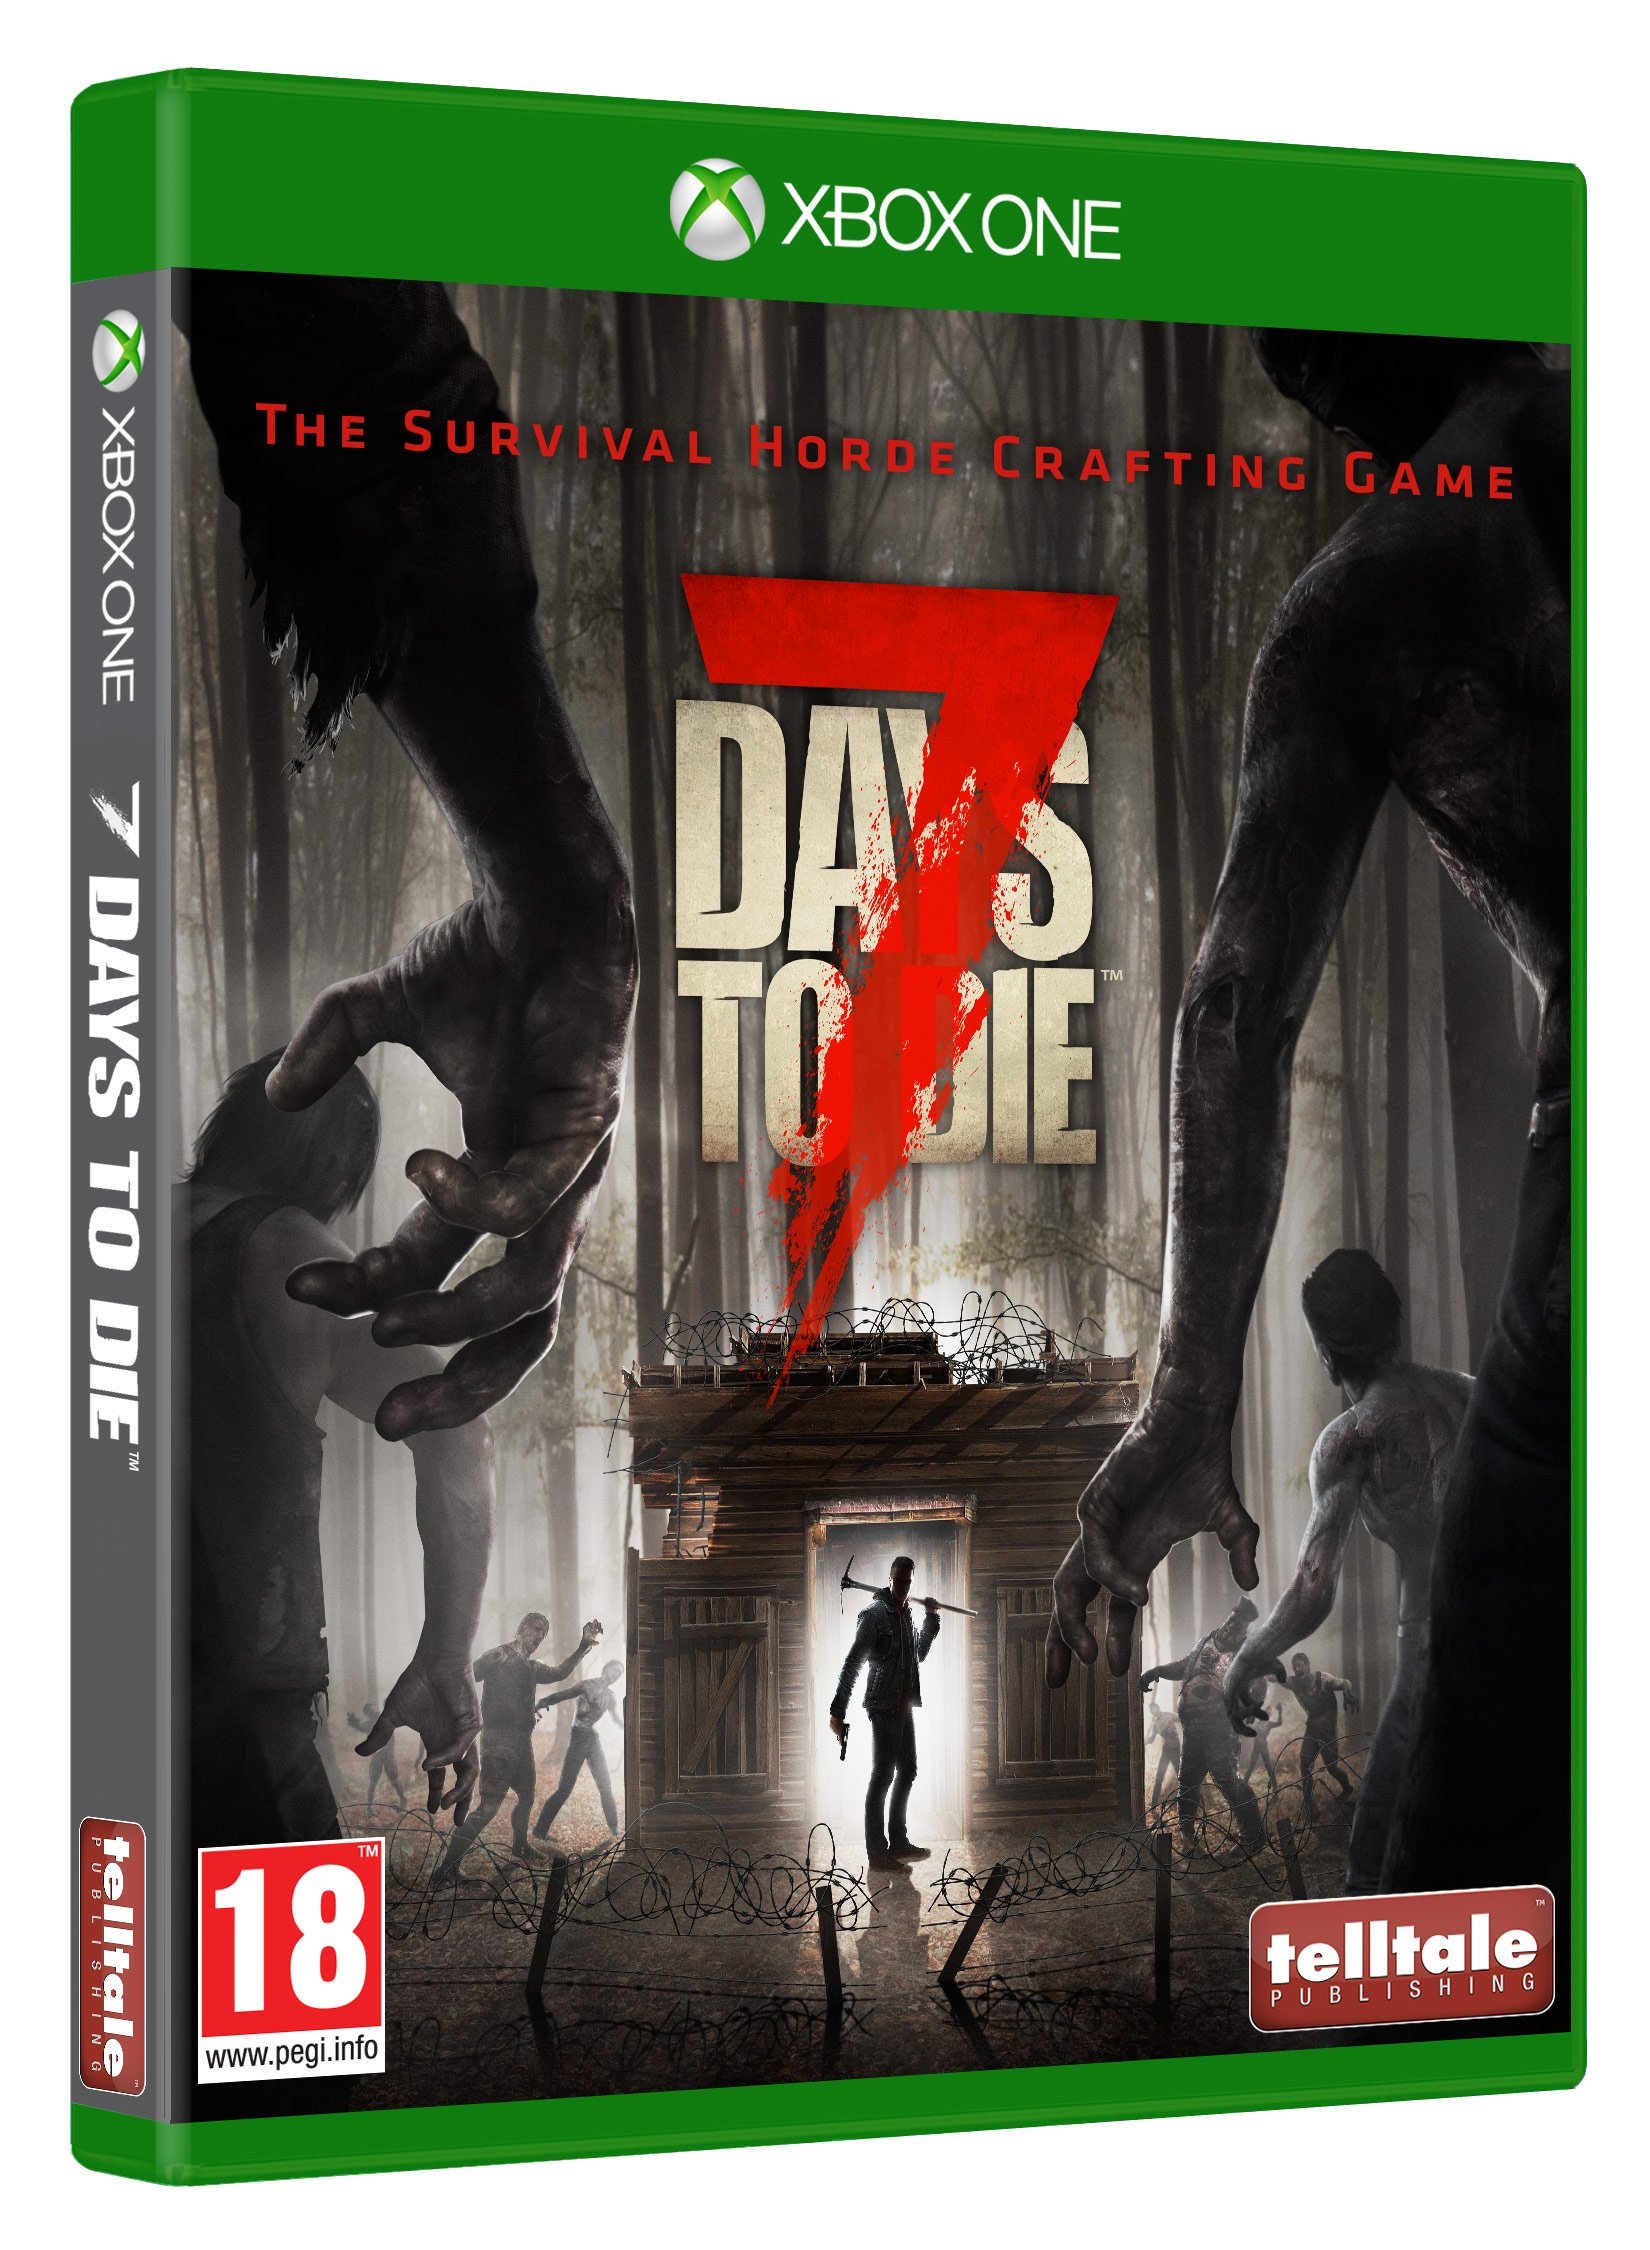 7 Days to Die (Xbox One) by Telltale